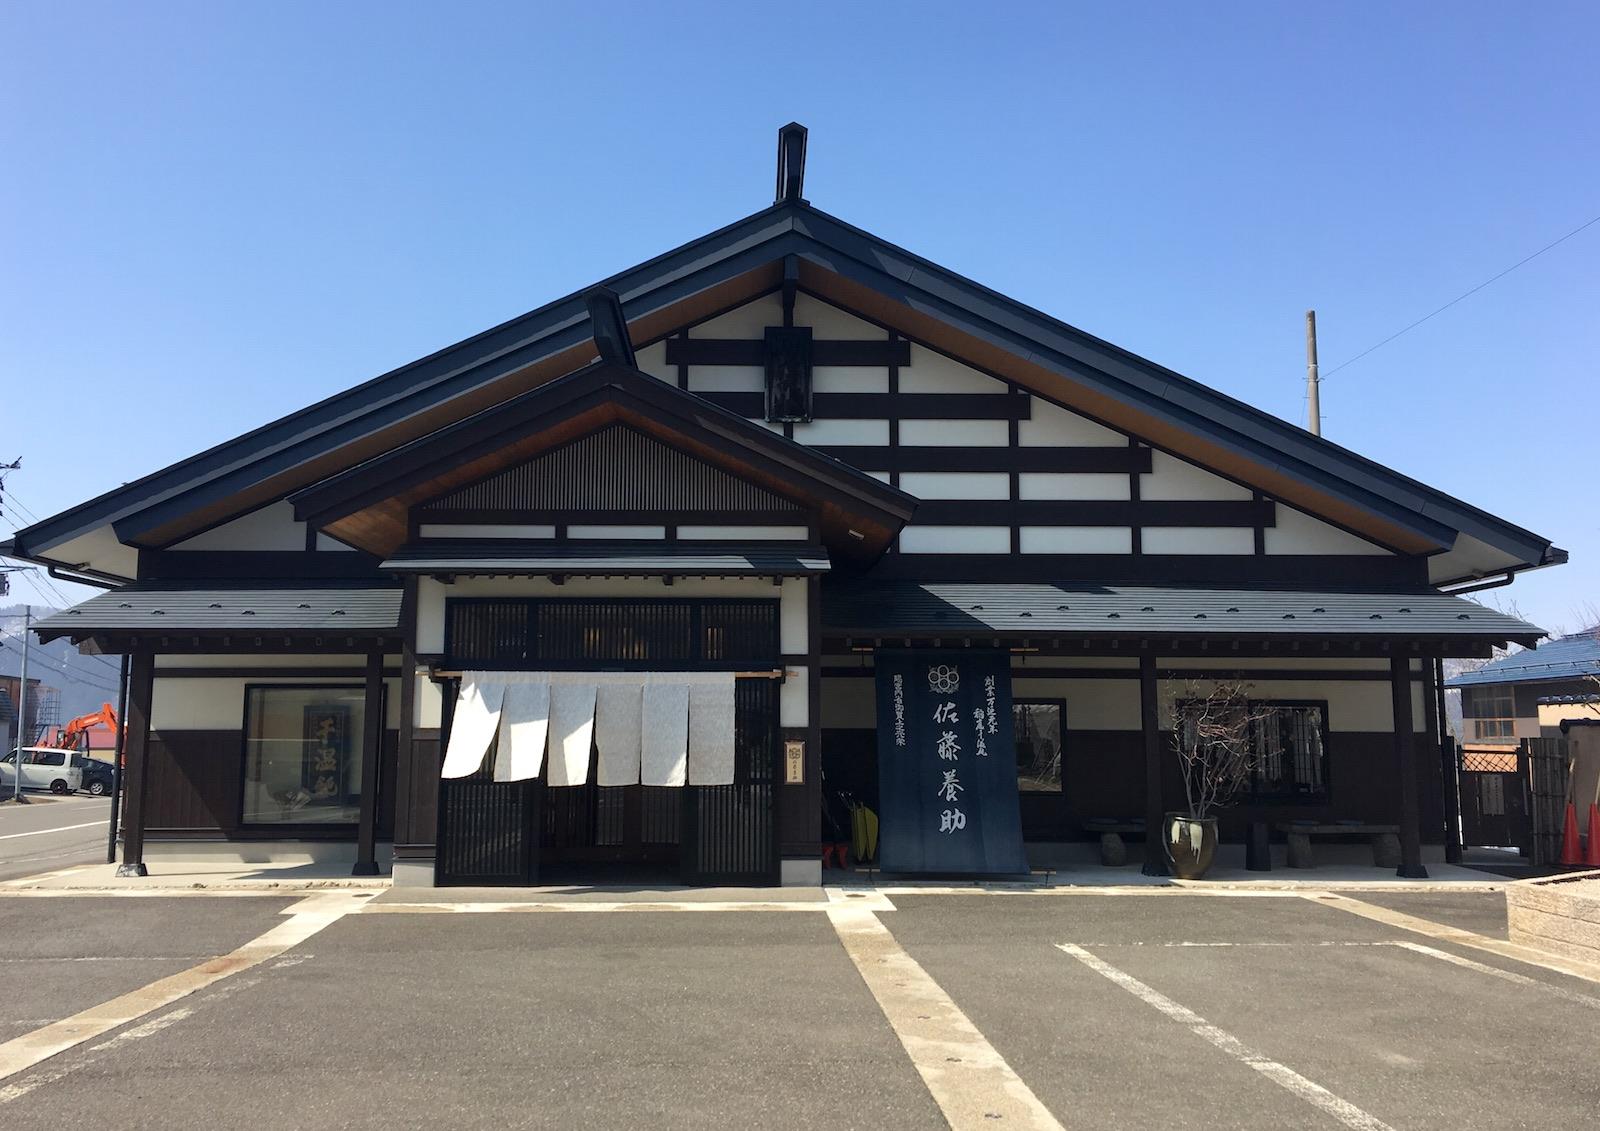 Sato Yosuke Inaniwa Udon factory